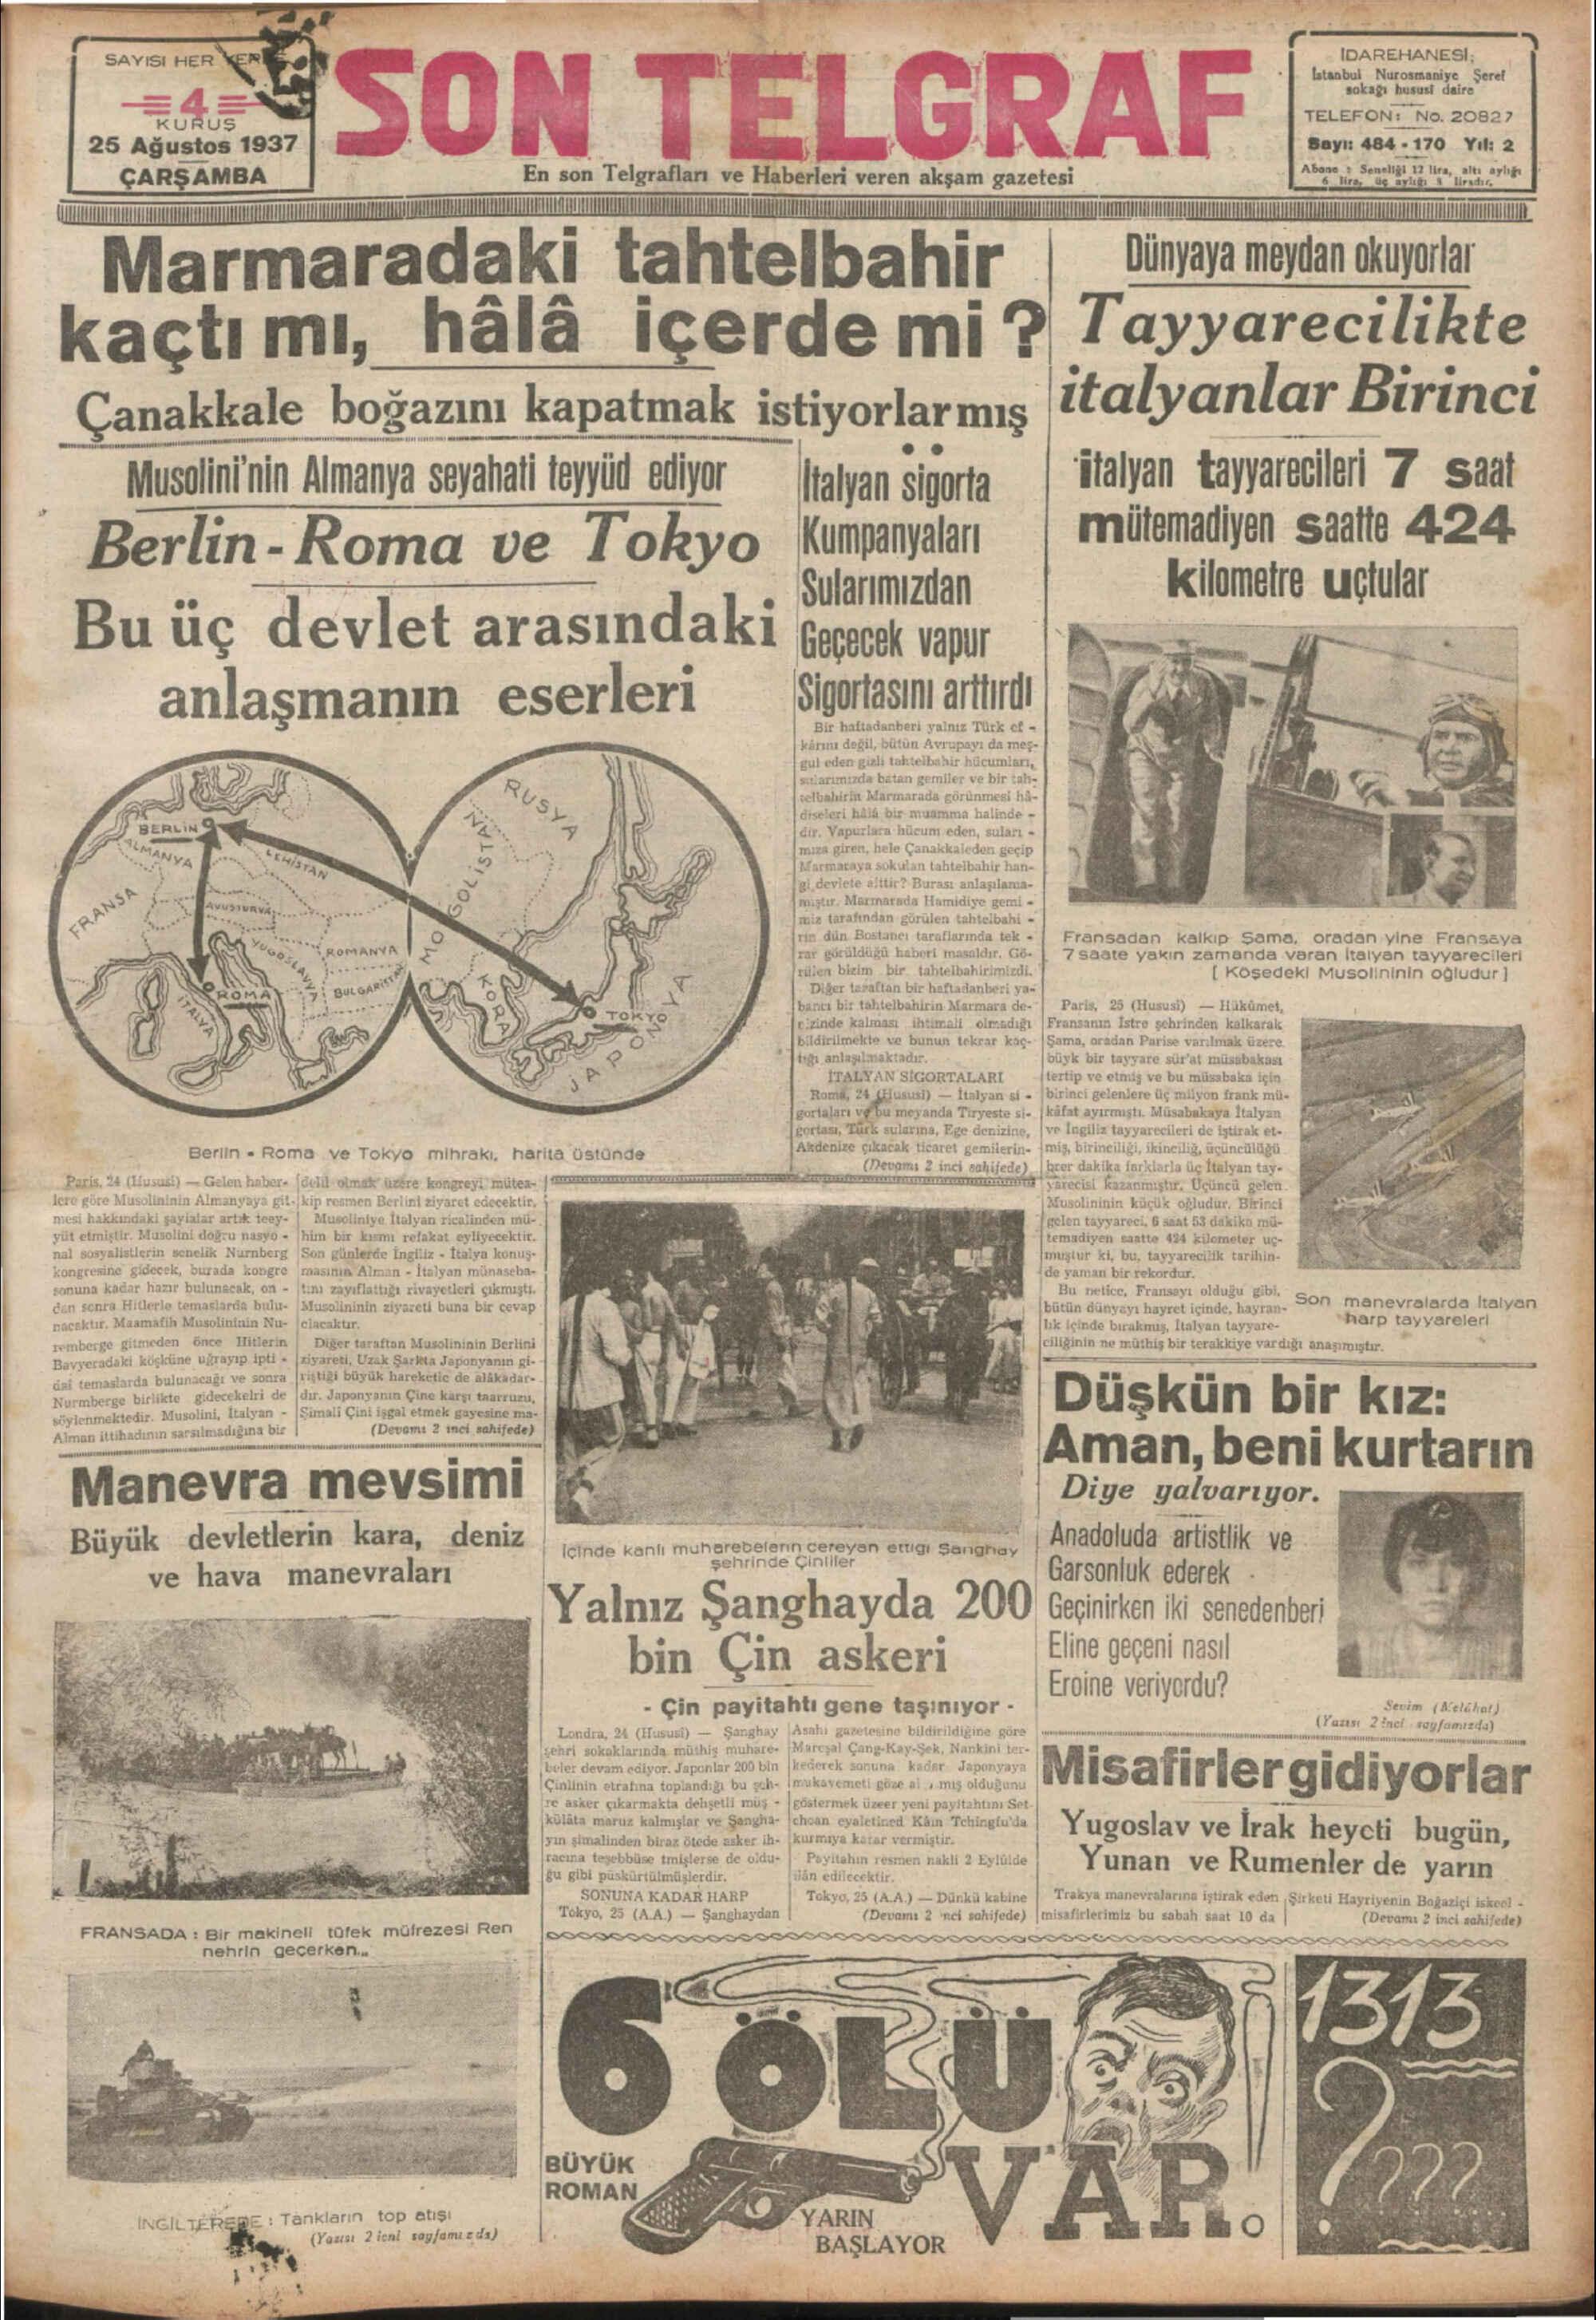 25 Ağustos 1937 Tarihli Son Telgraf Gazetesi Sayfa 1